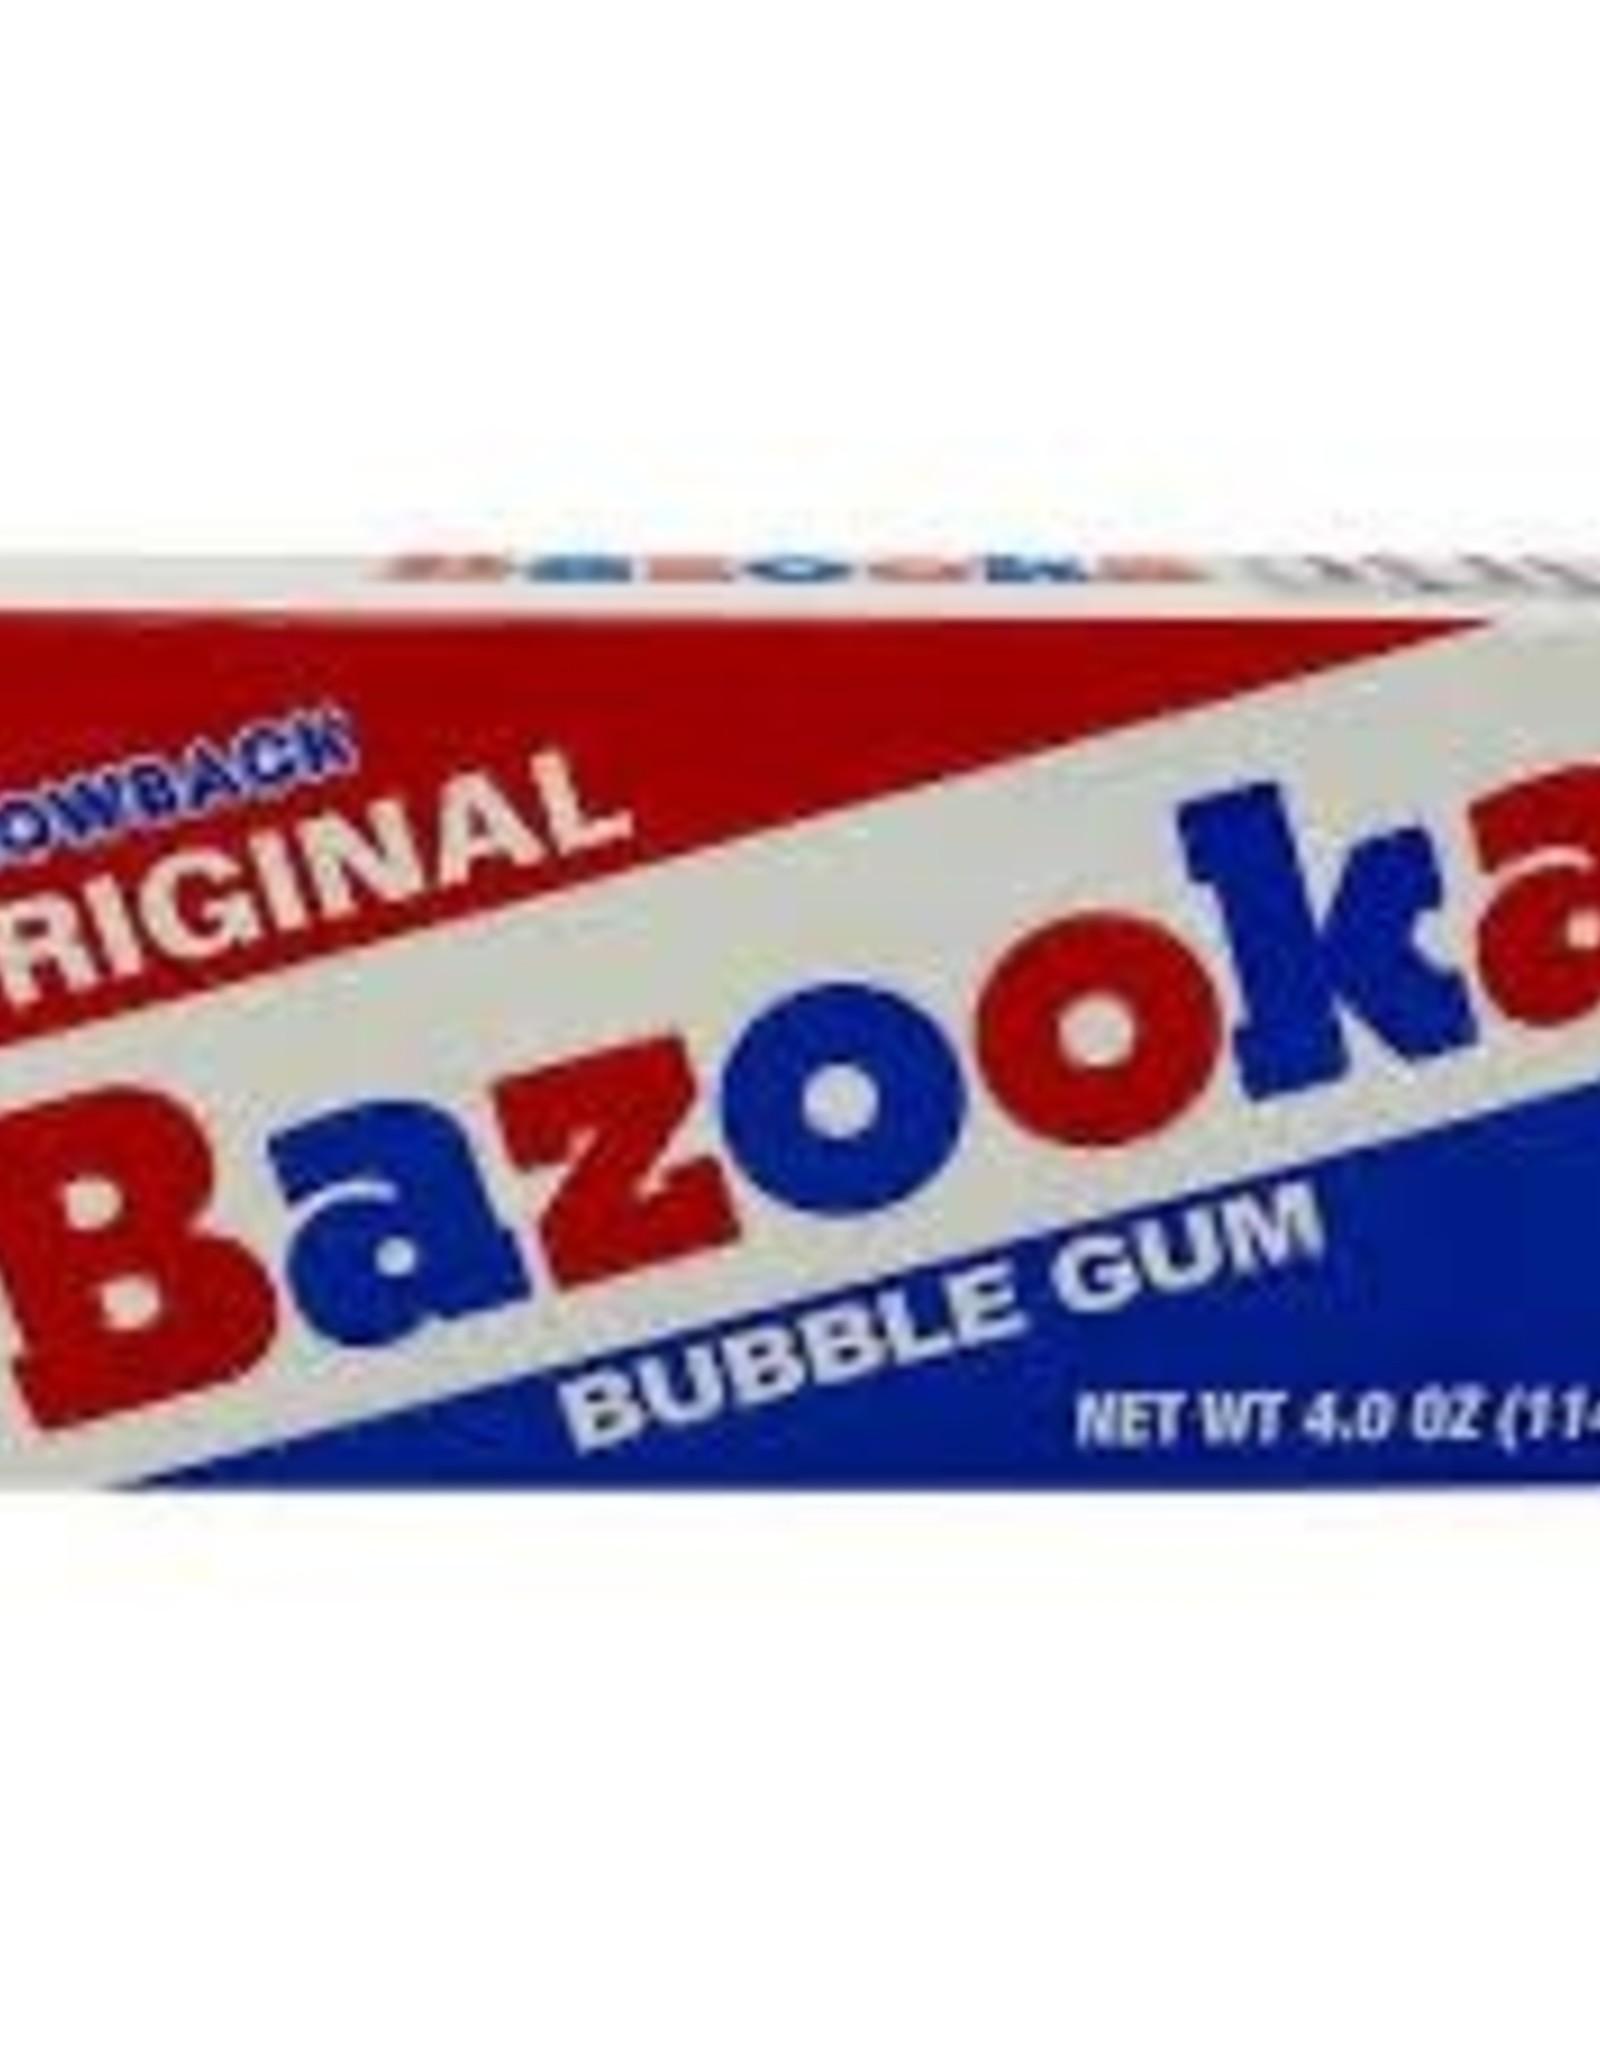 Bazooka Party Box Throwback Original